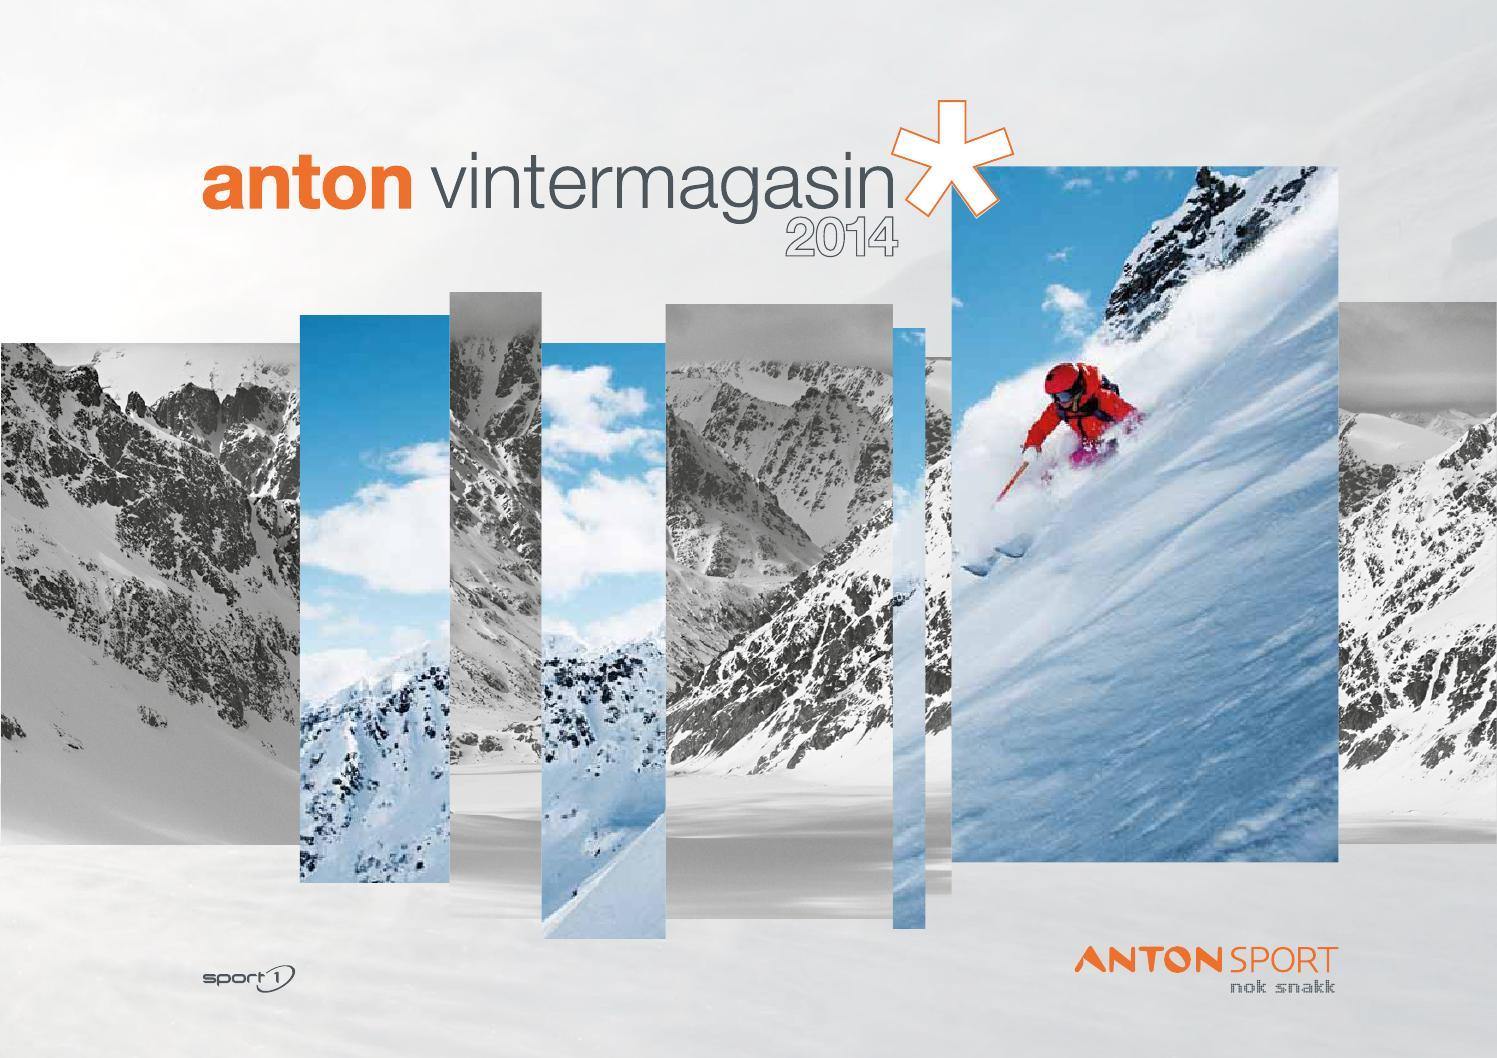 66fadd1c Anton Sport Vintermagasin 2014 by INK DESIGN - issuu